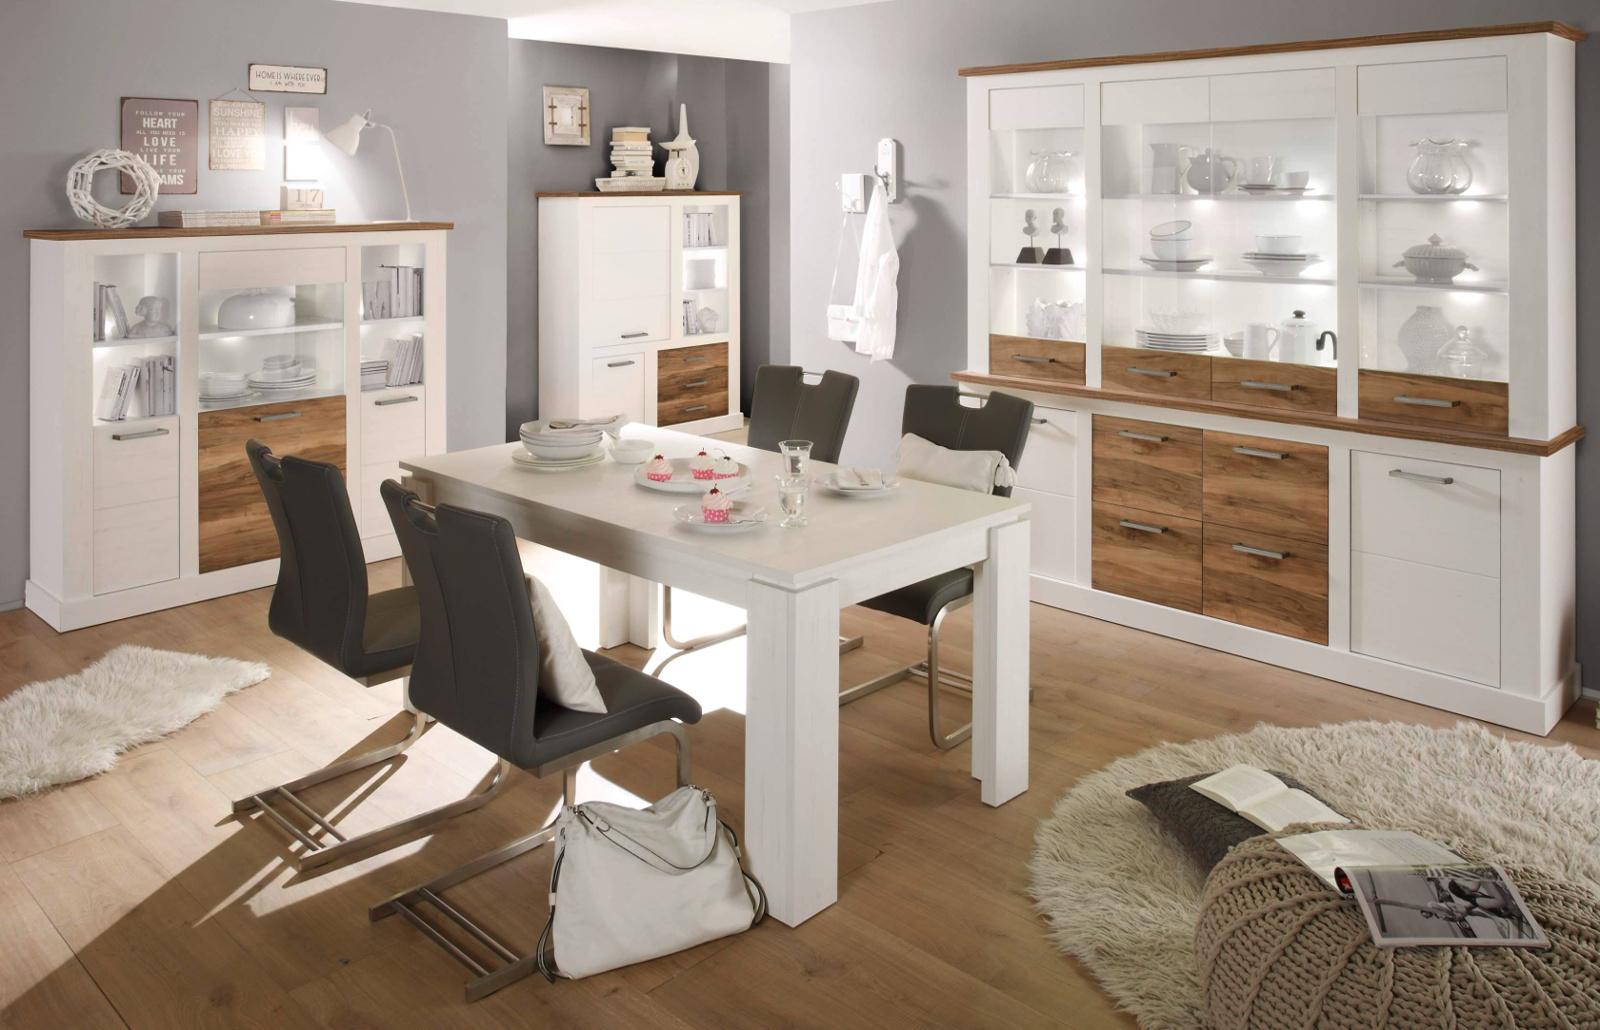 highboard toronto anderson pinie wei nussbaum. Black Bedroom Furniture Sets. Home Design Ideas